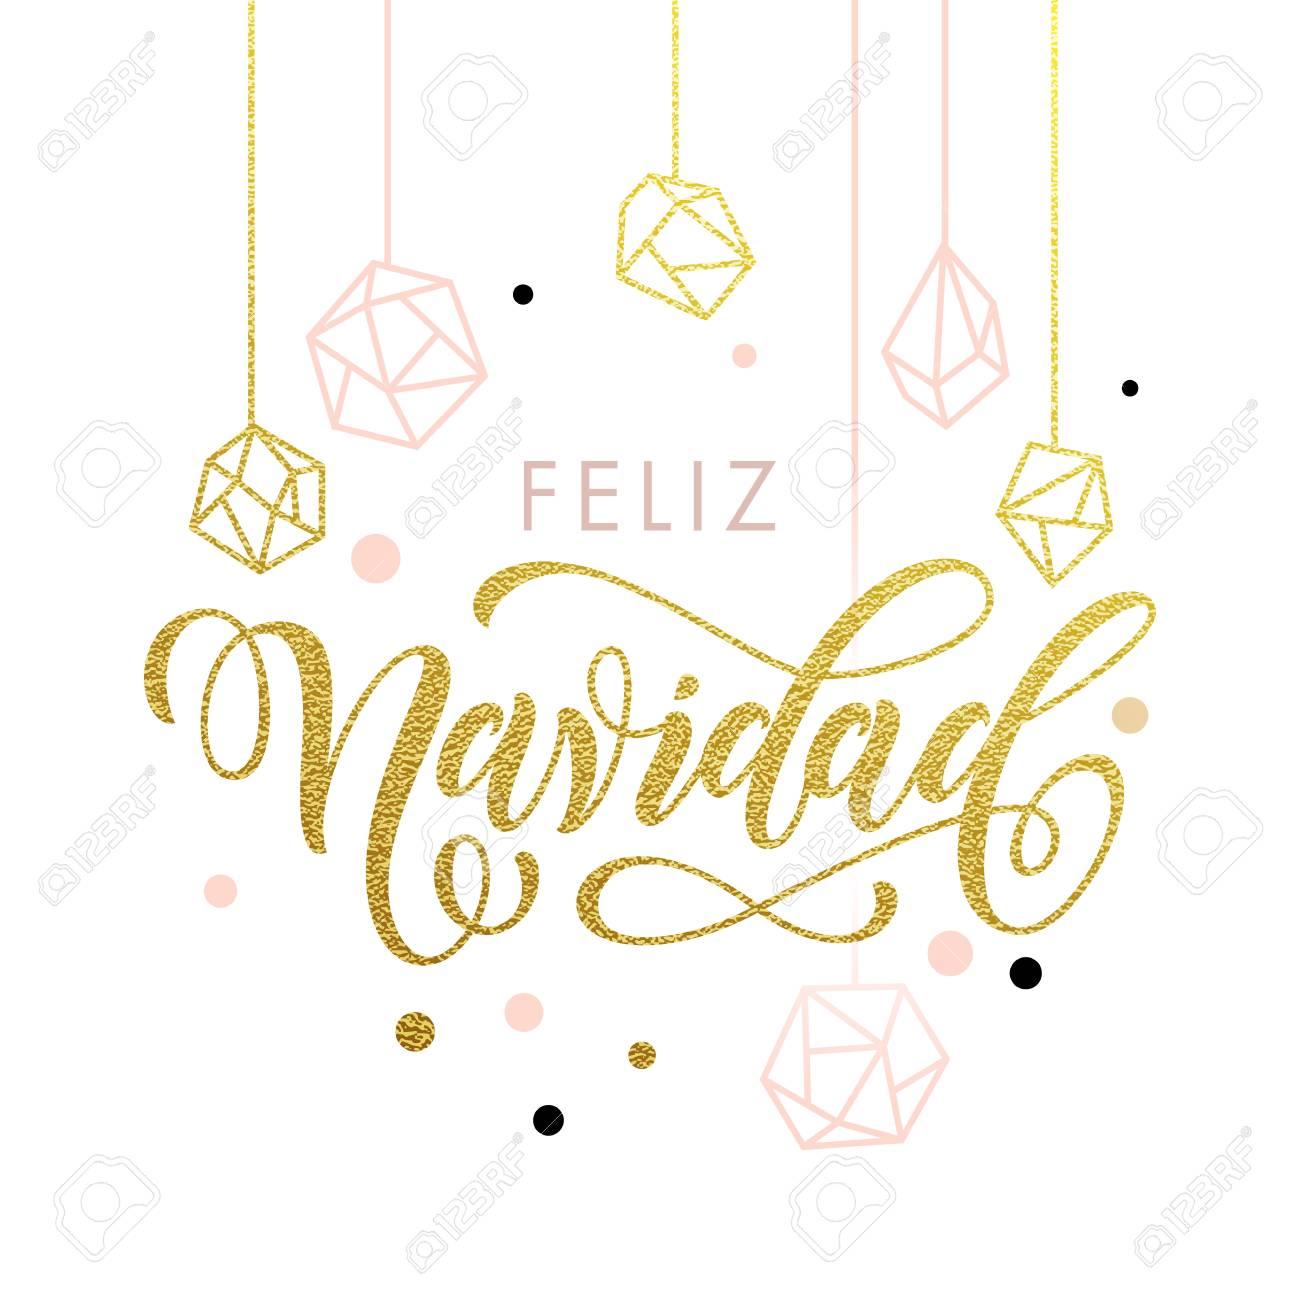 Spanish Merry Christmas Feliz Navidad Greeting Cards With Gold ...